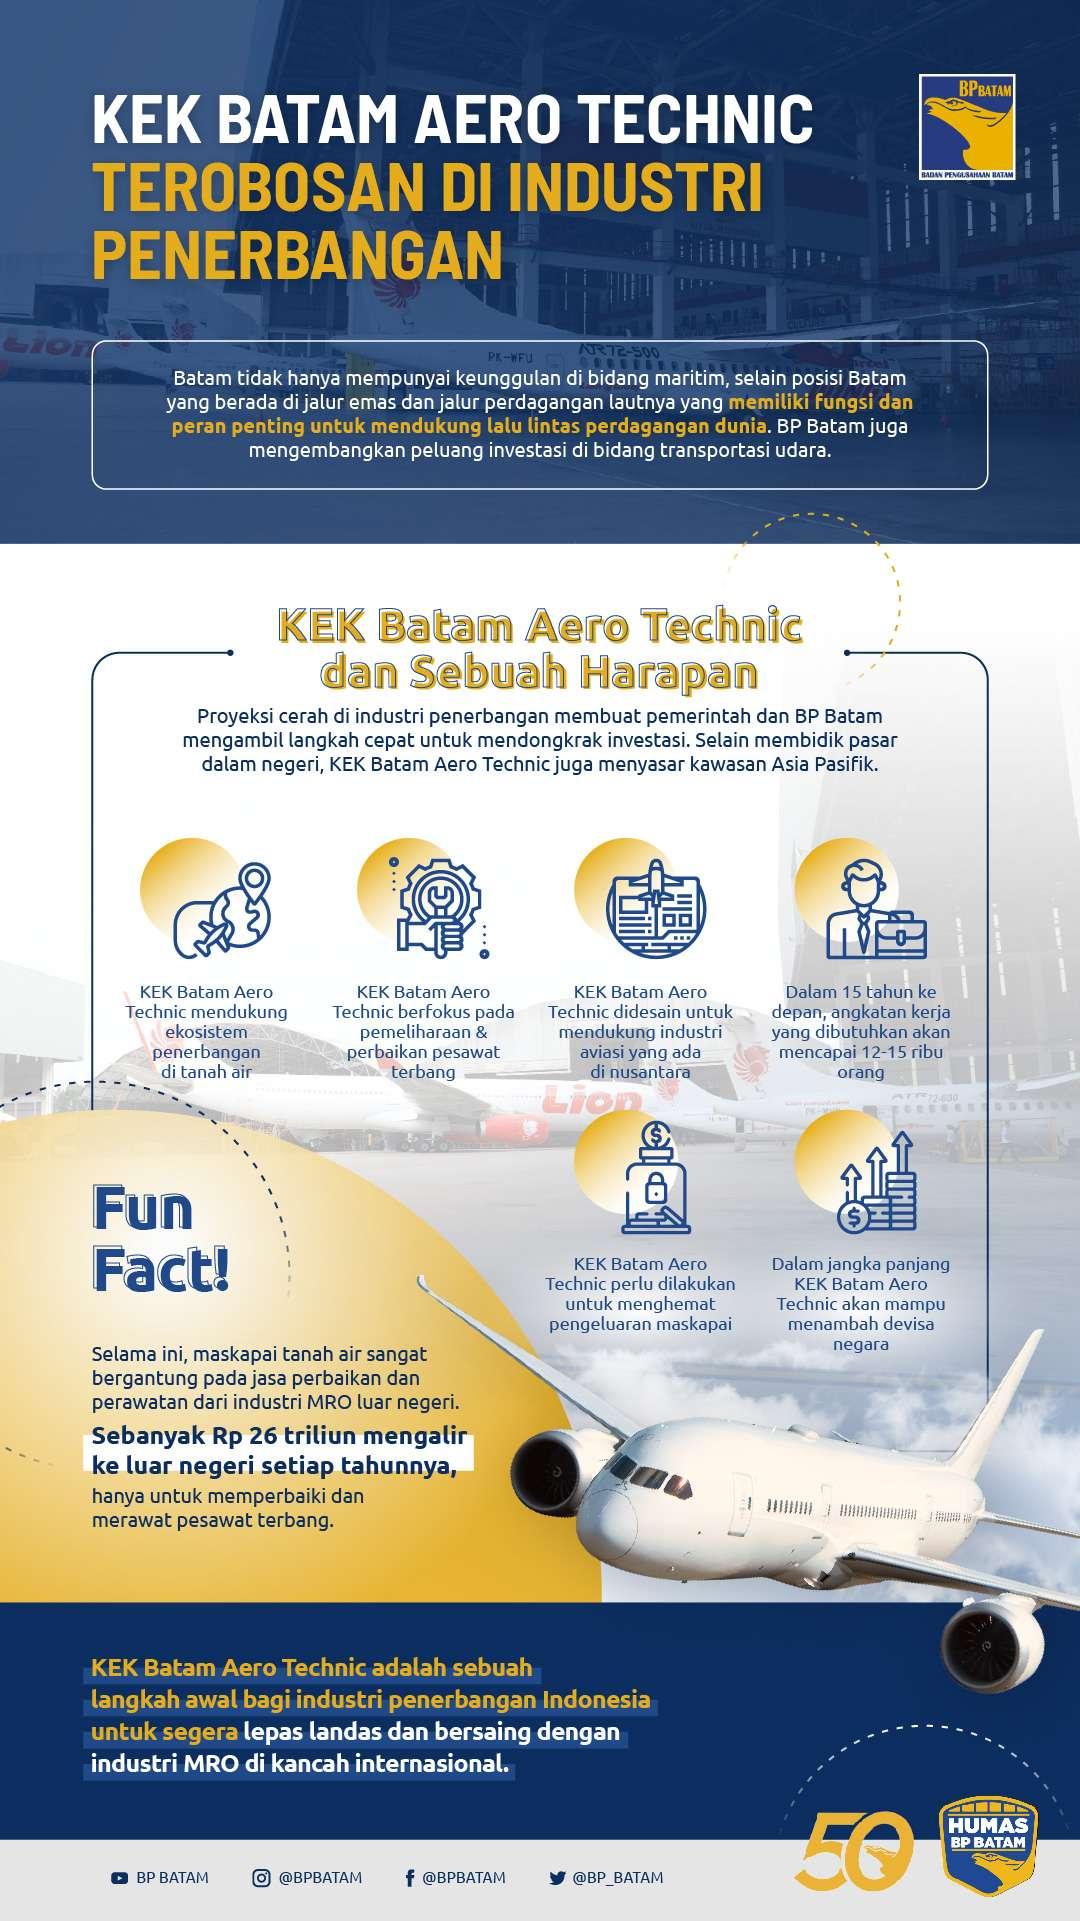 KEK Batam Aero Technic Kawasan Ekonomi Khusus Terobosan di Industri Penerbangan